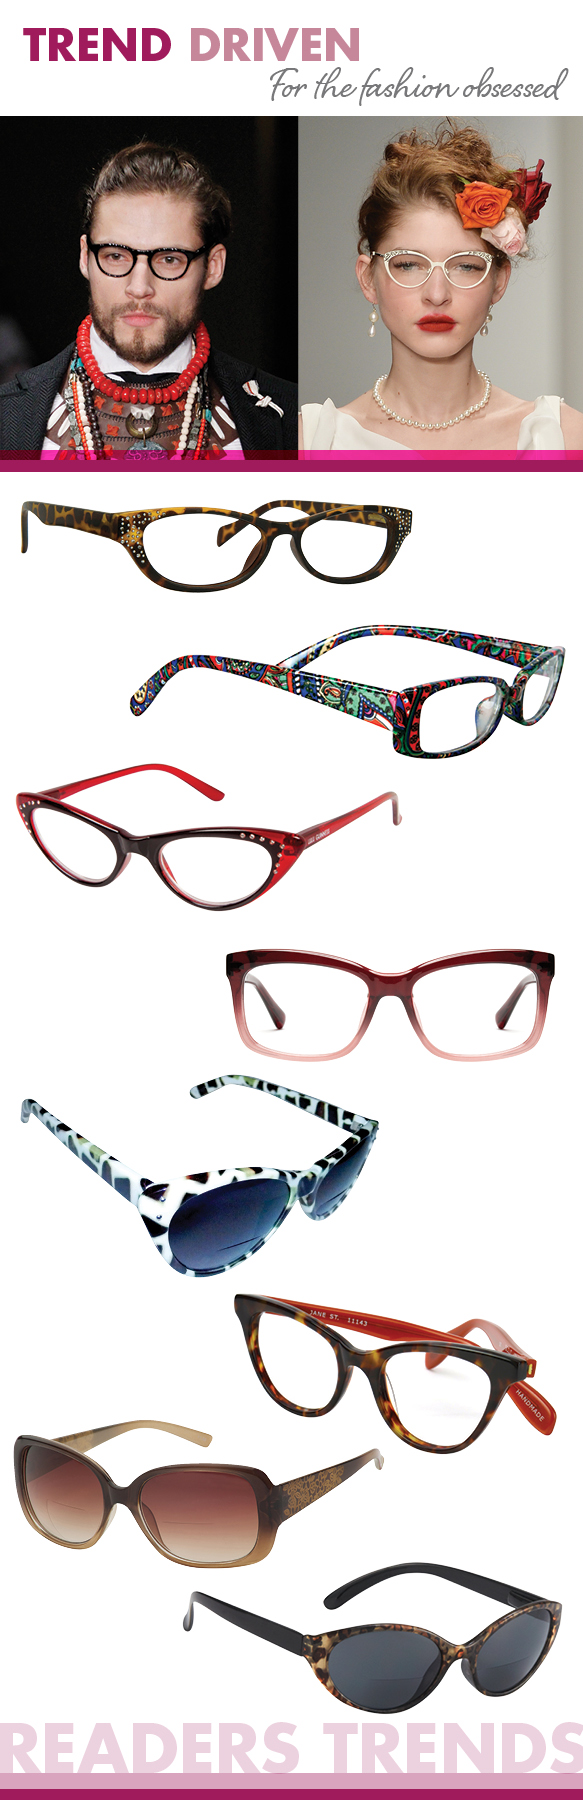 Cinzia Designs (Beam), Vera Bradley (Jackie), Lulu Guinness (LS02), Kate Spade (Brooklyn), Desert Sunglass of Scottsdale (SR17429), Ogi Eyewear (Jane Street), Hilco (Flourish), I Heart Eyewear (Felina)